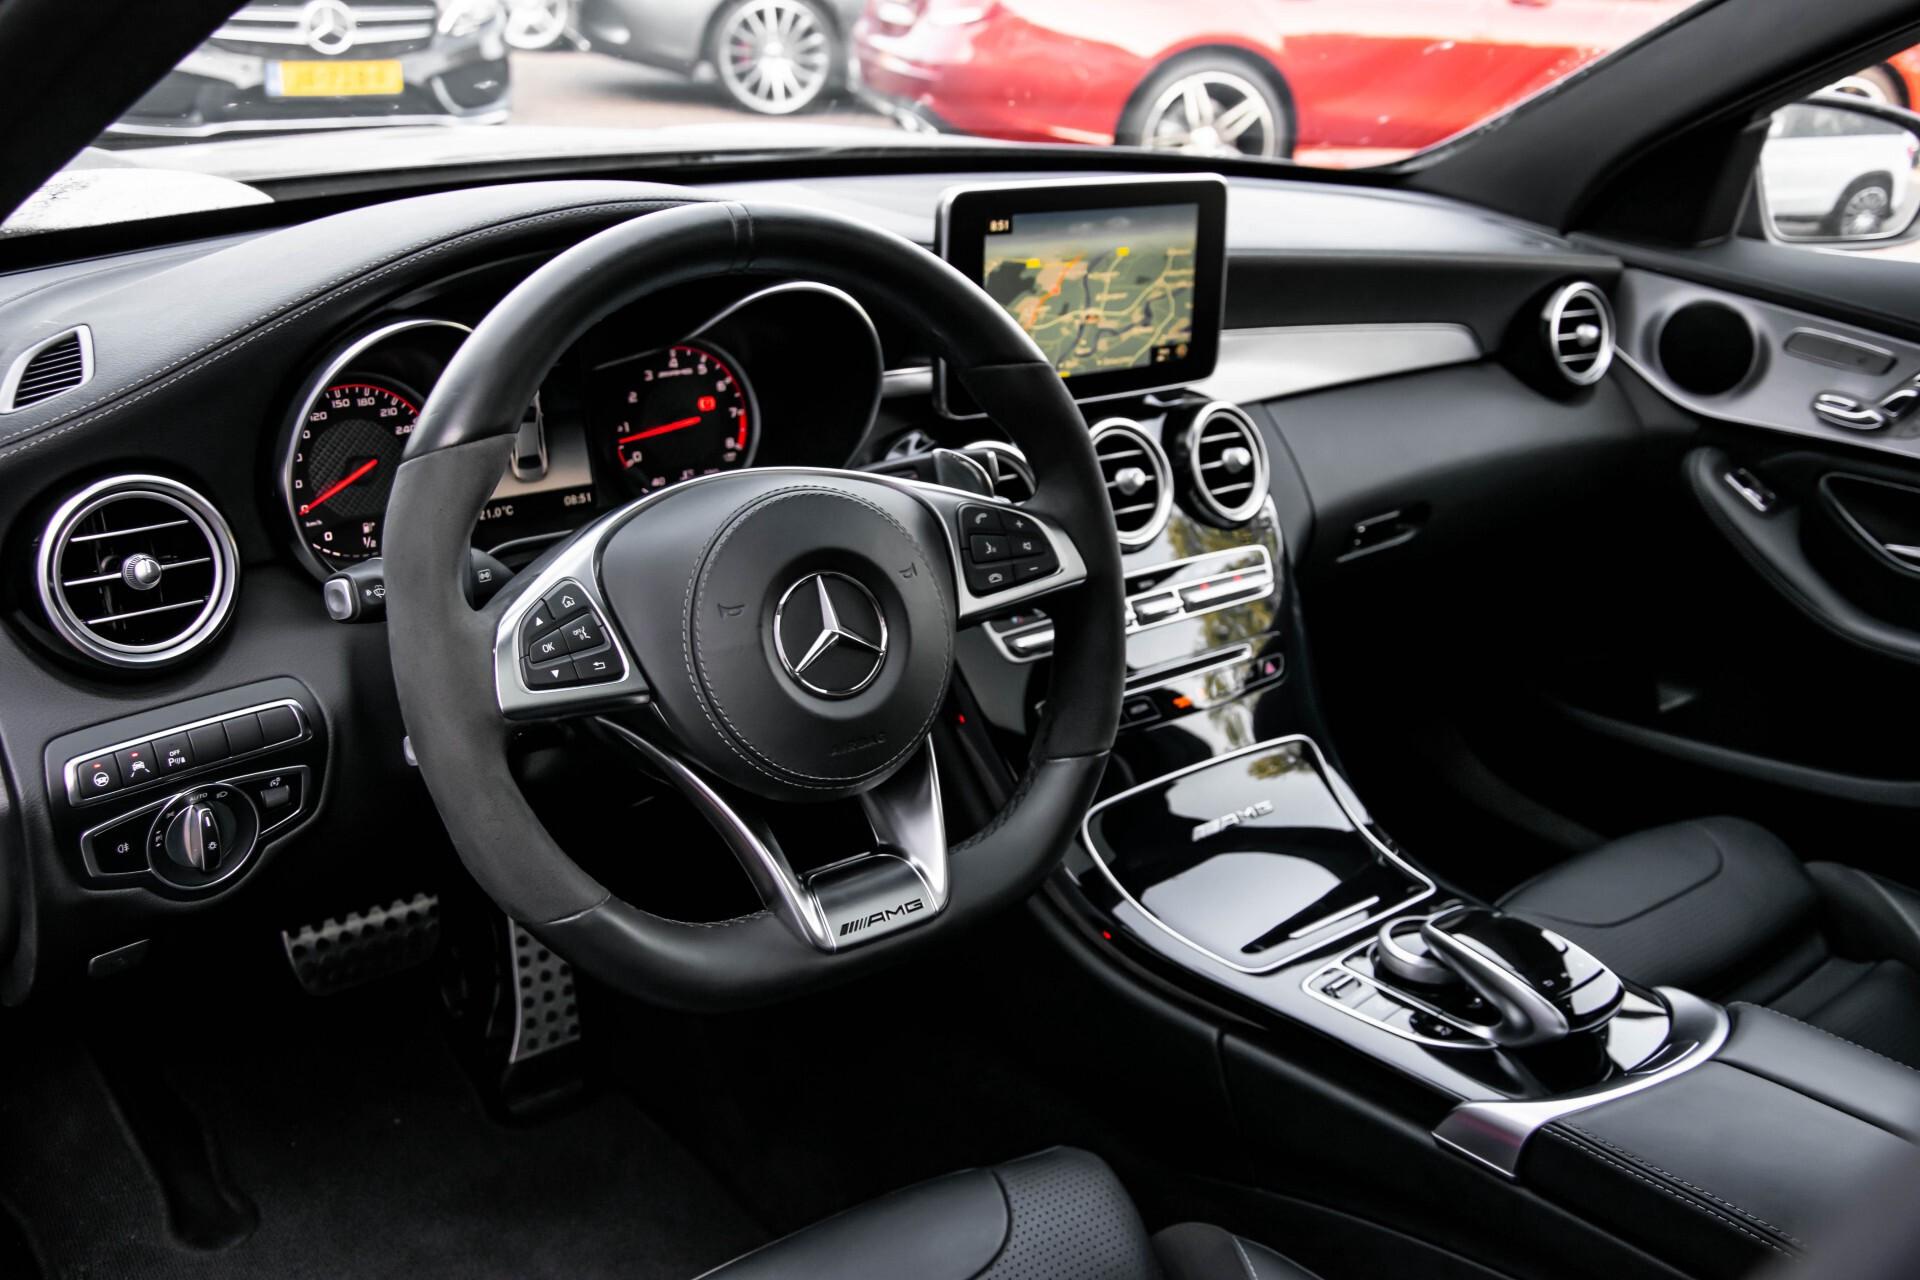 Mercedes-Benz C-Klasse 63 AMG S Panorama/Distronic/Keyless/Comand/Camera/ILS Aut7 Foto 7